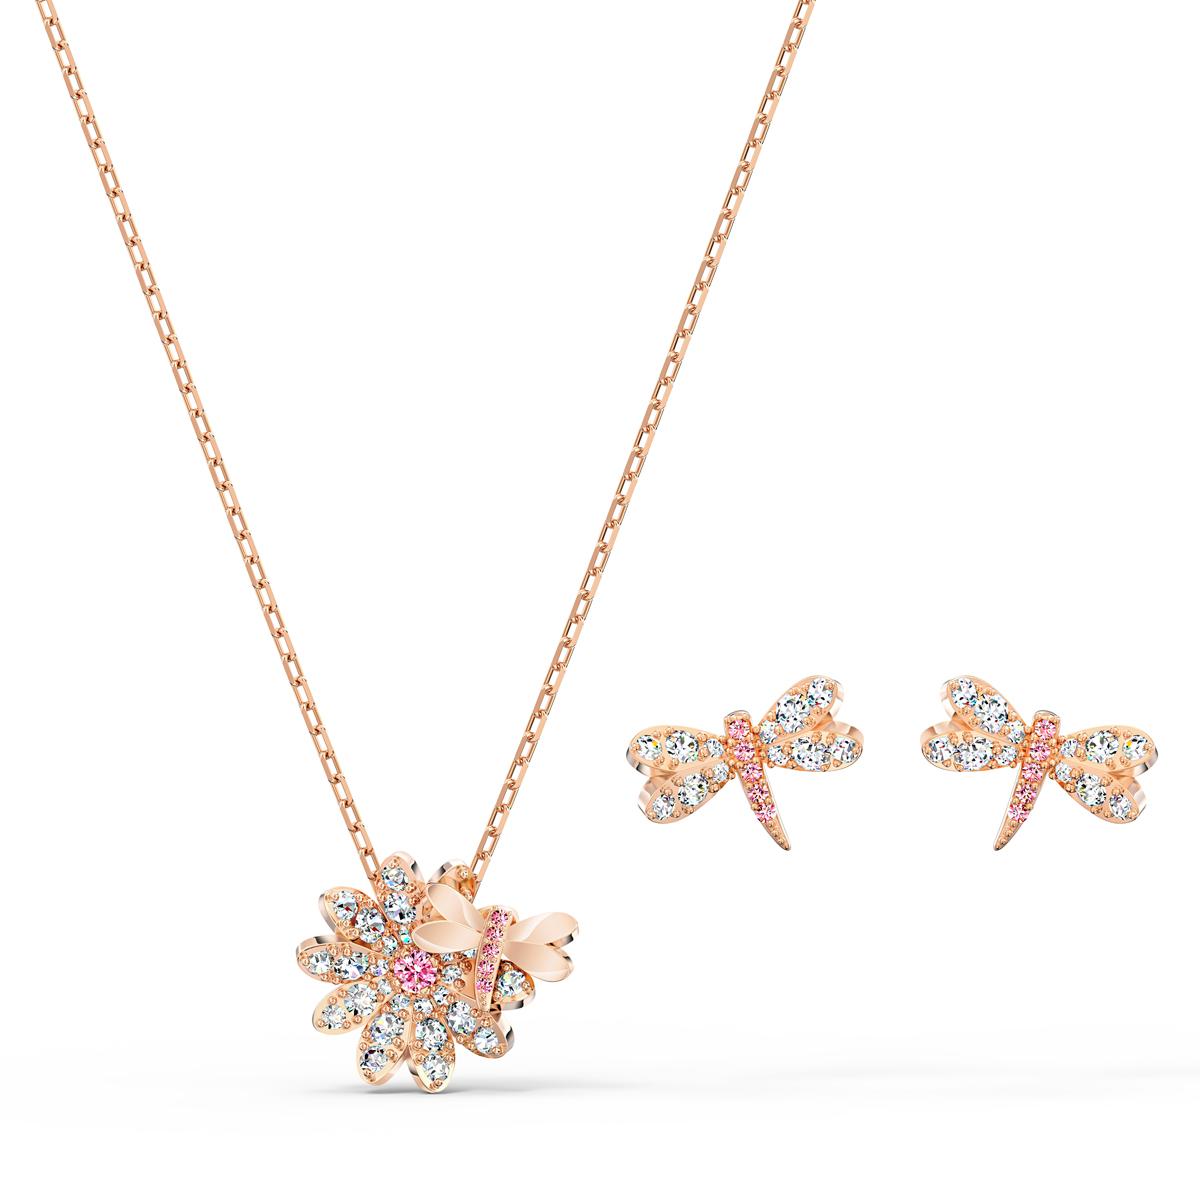 Swarovski Eternal Flower Necklace and Earring Set Dragonfly Light Multi Rose Gold